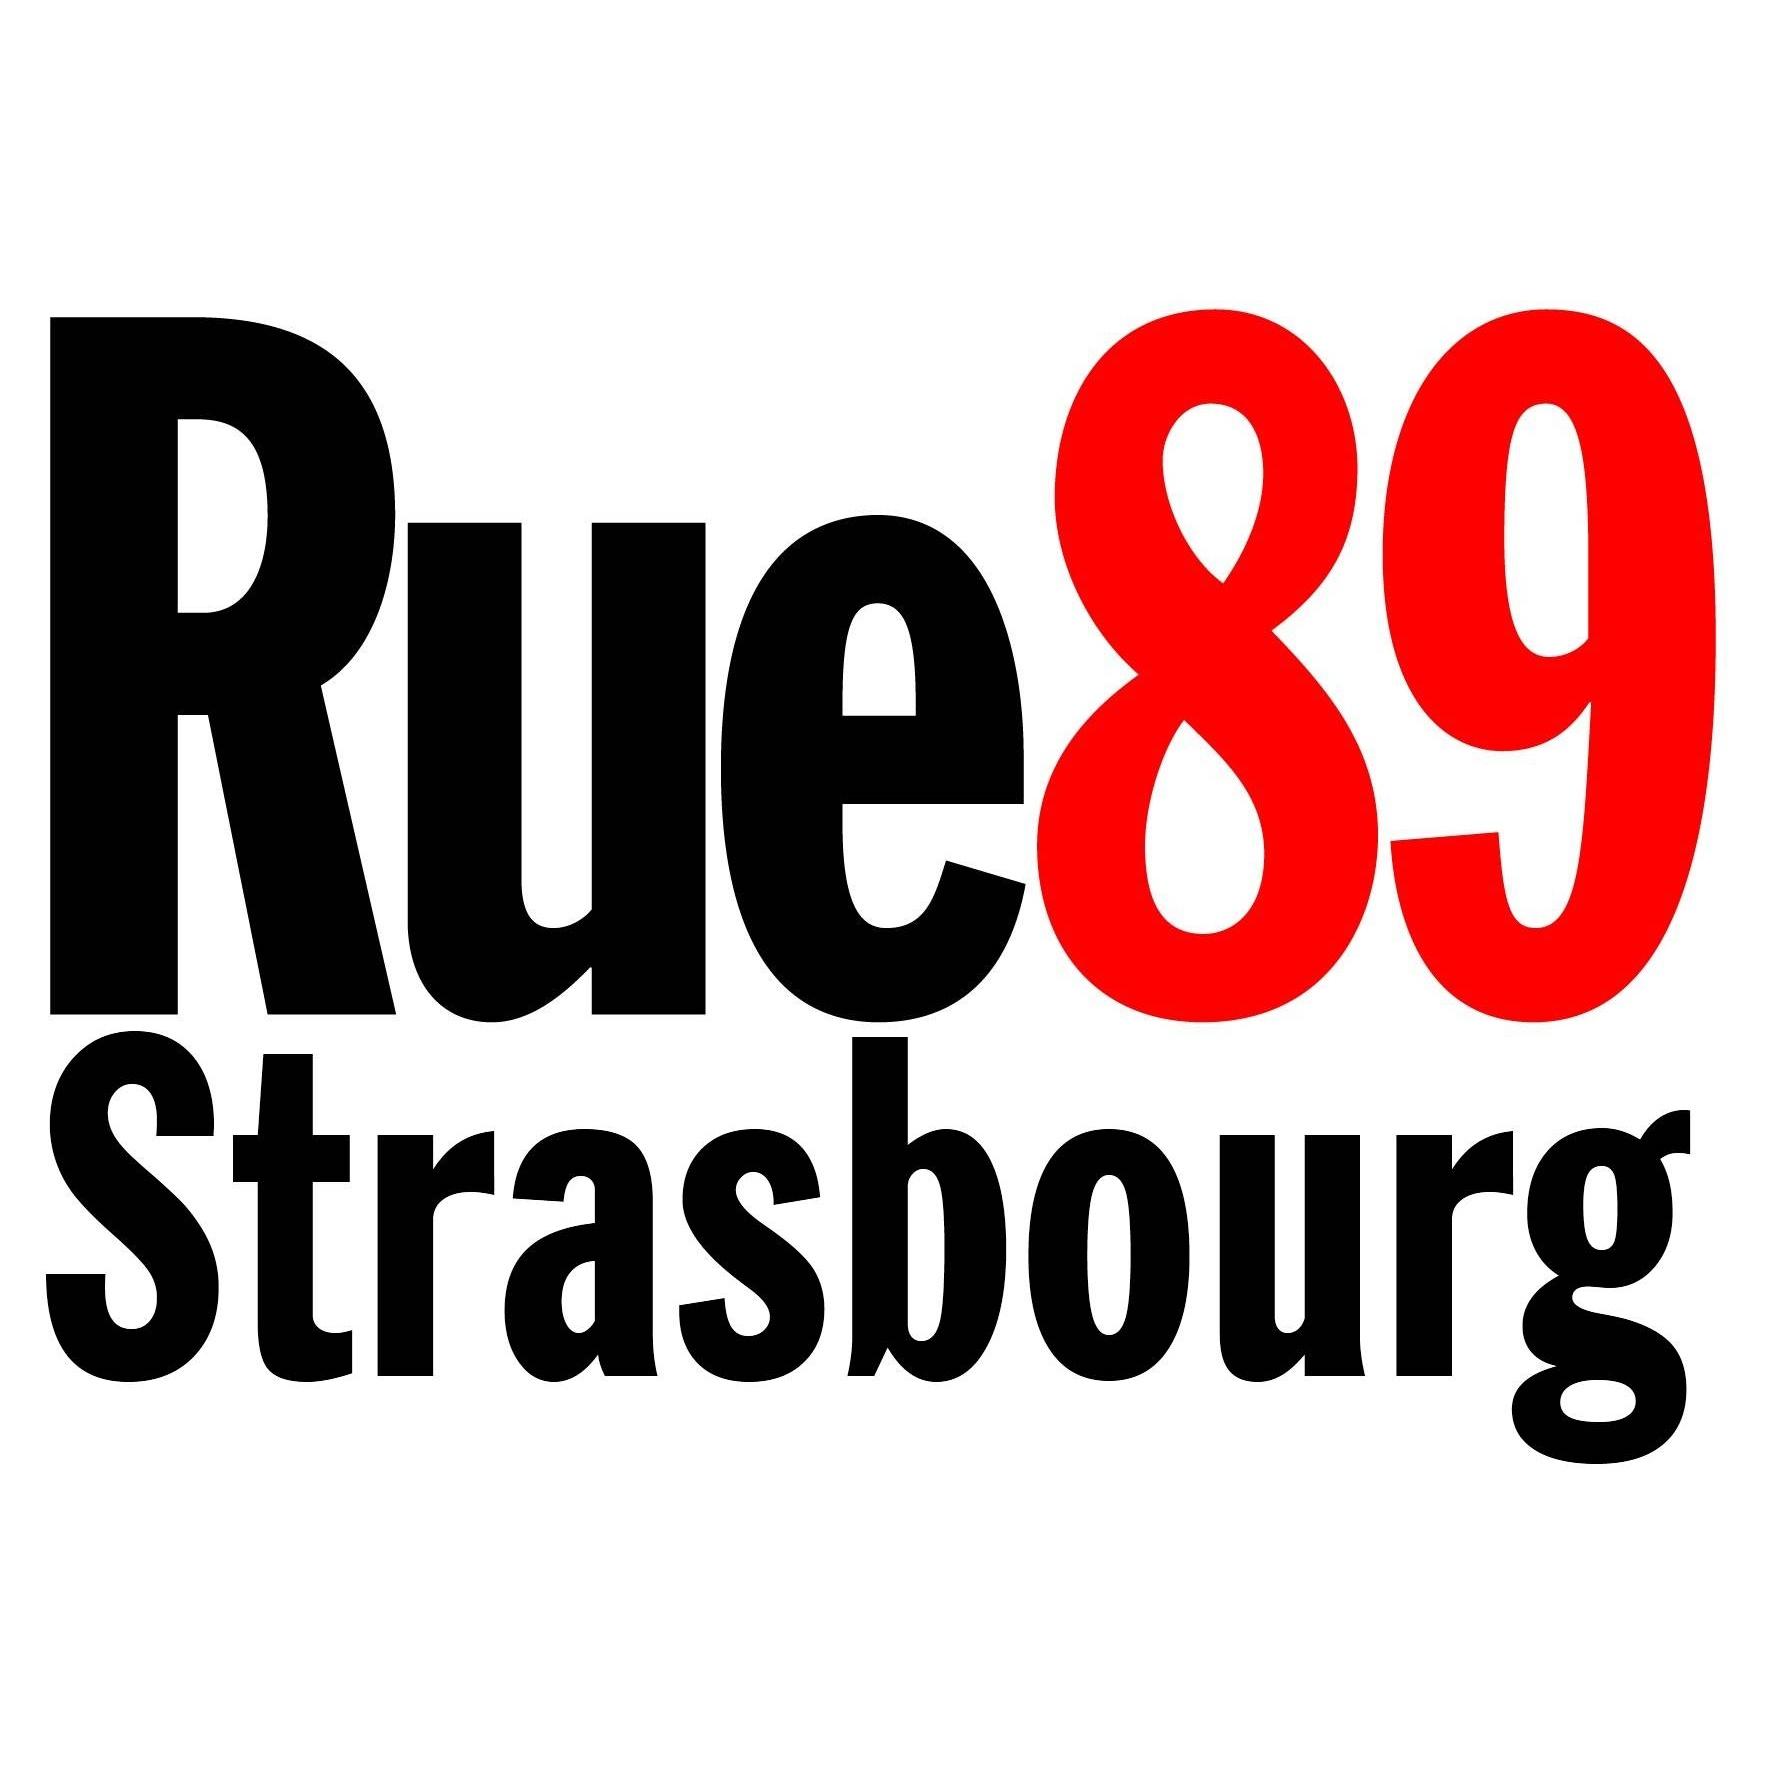 rue89 Strasbourg.jpg